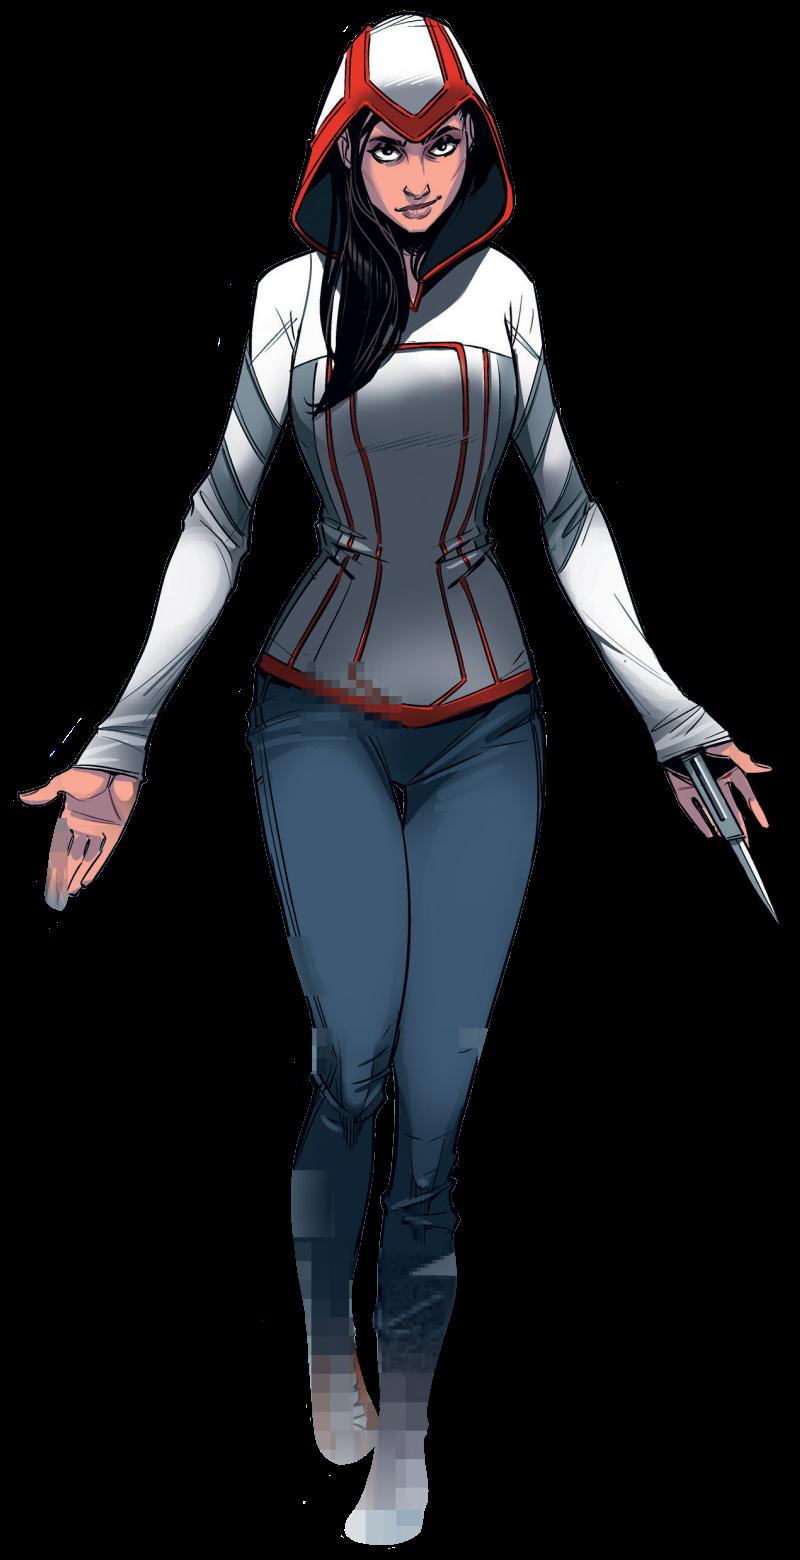 picture free download Gauntlet drawing assassin. Charlotte de la cruz